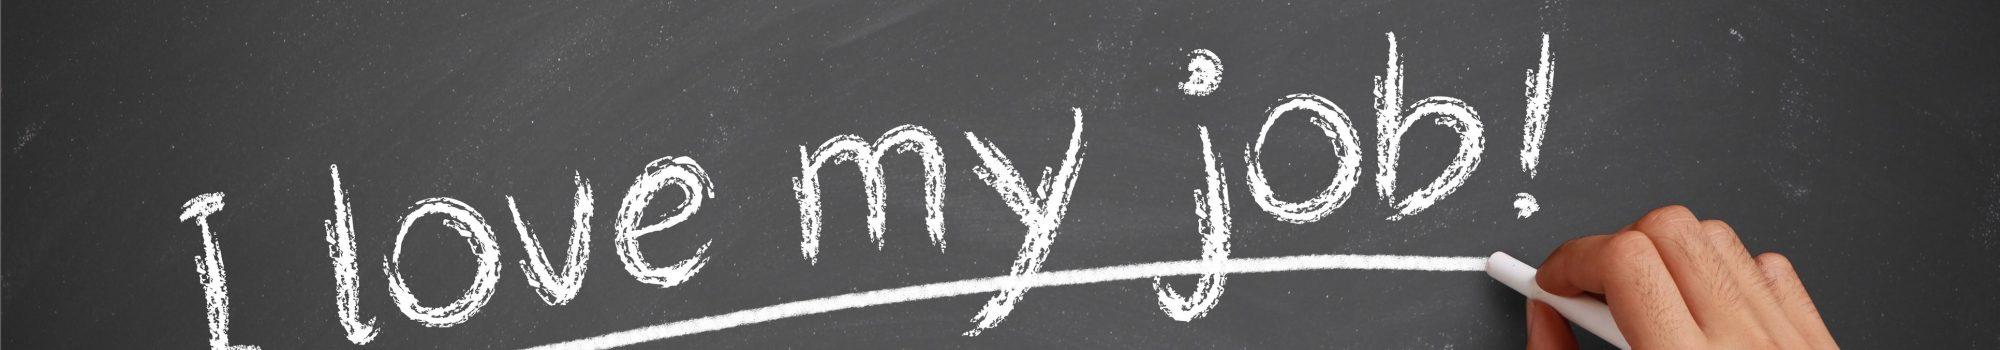 Hand with white chalk writing 'I love my job!' on chalkboard.